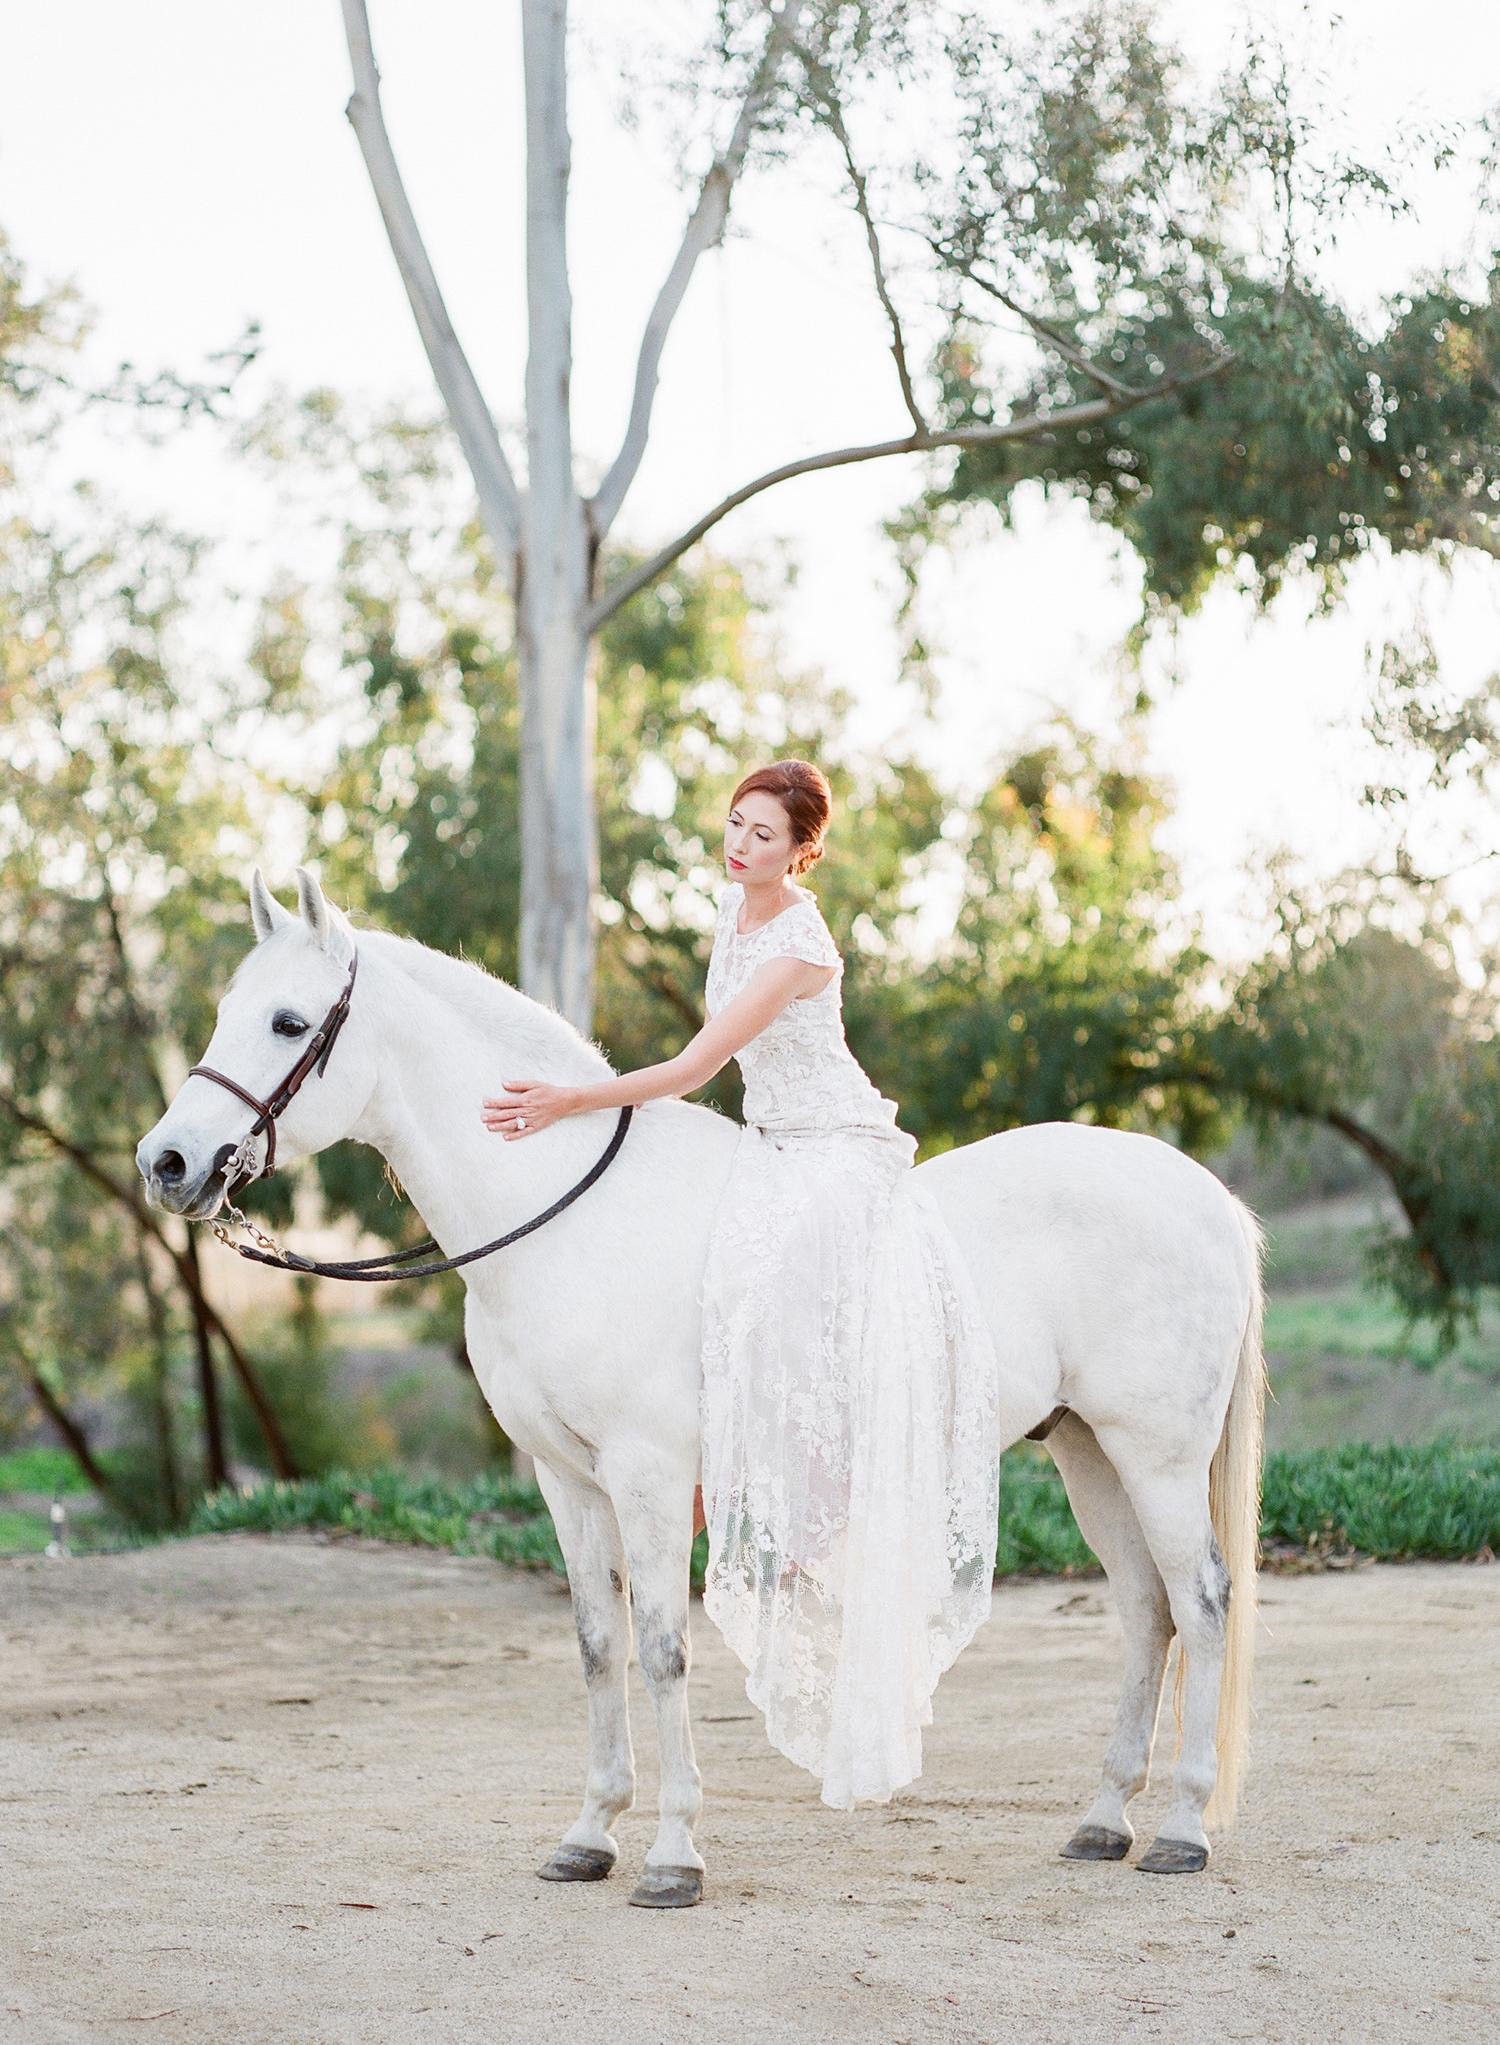 024-Jen-Wojcik-Photography-San-Diego-Wedding-Photographer.jpg